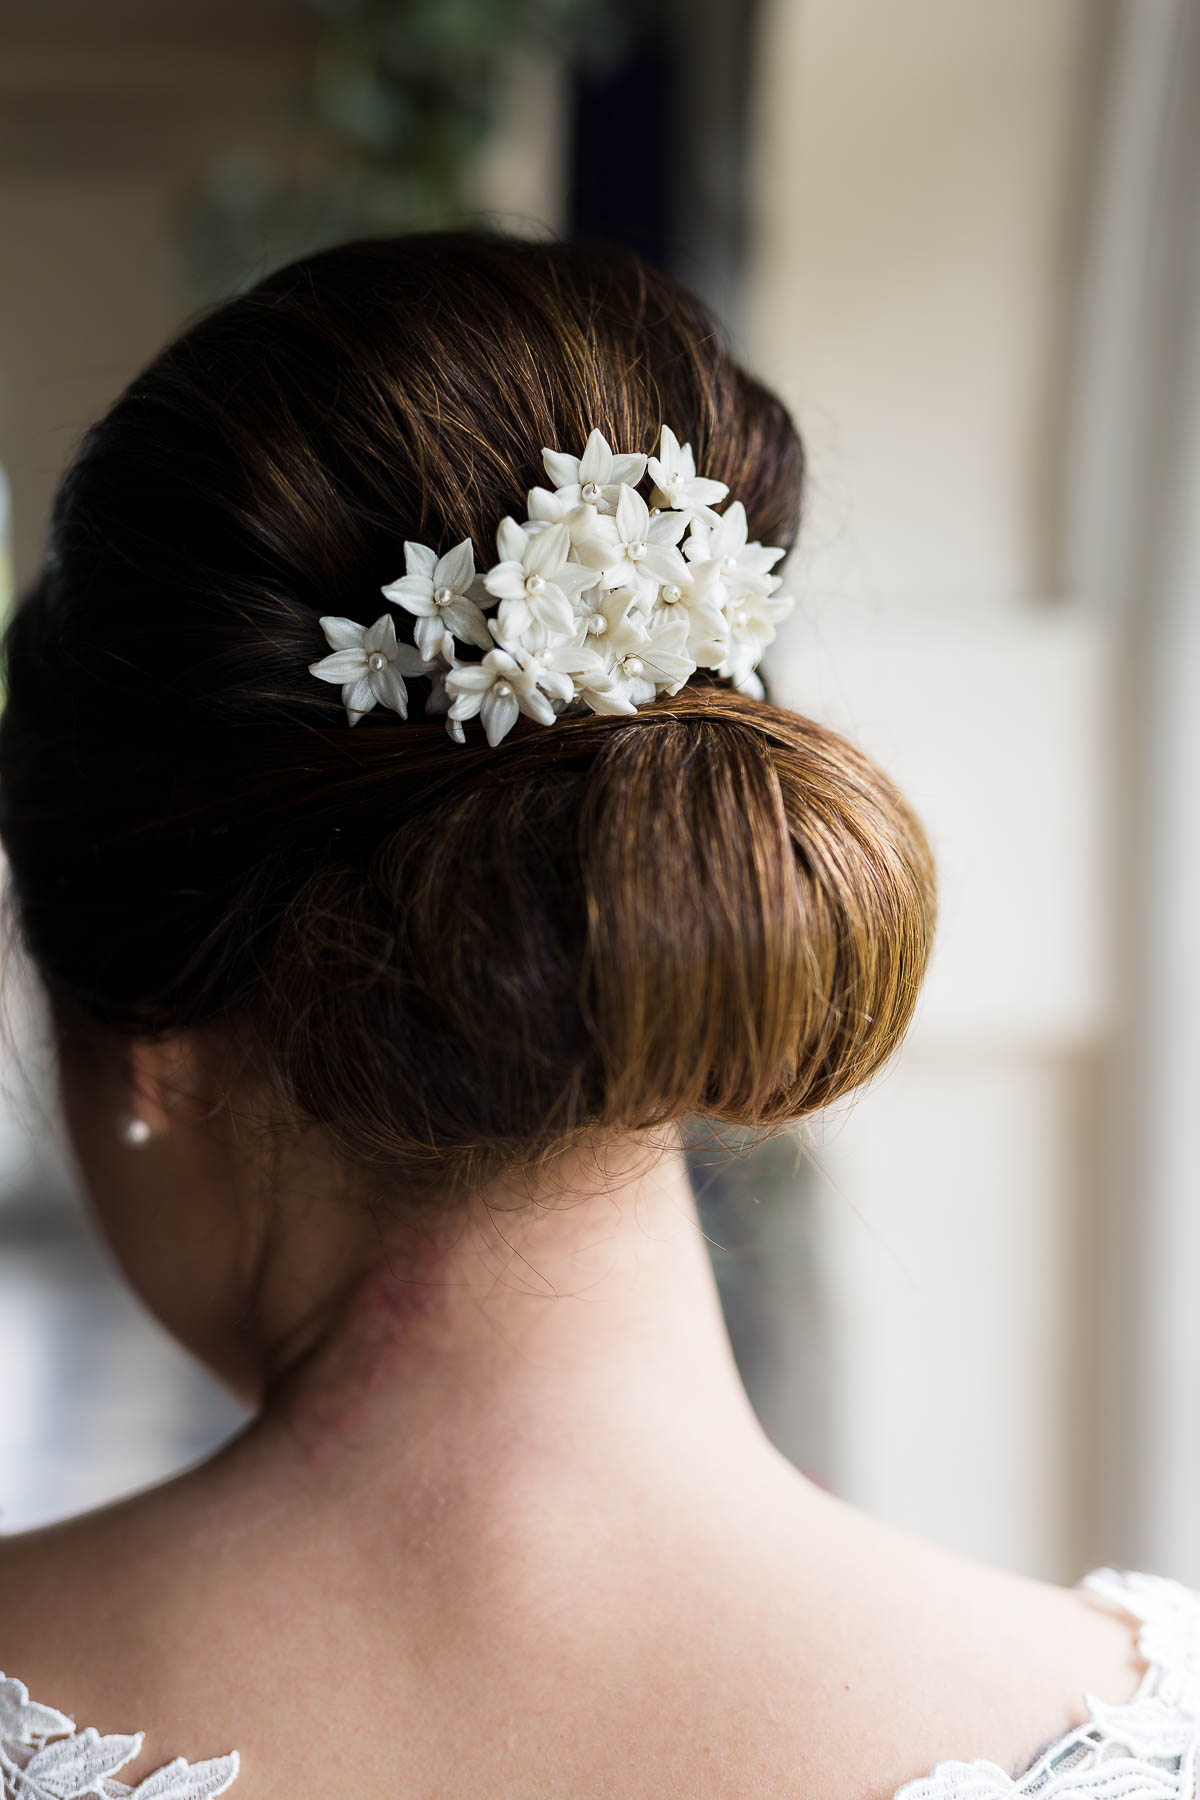 white floral brides hair piece bespoke design by Bedfordshire designer Rachel Louise bridal